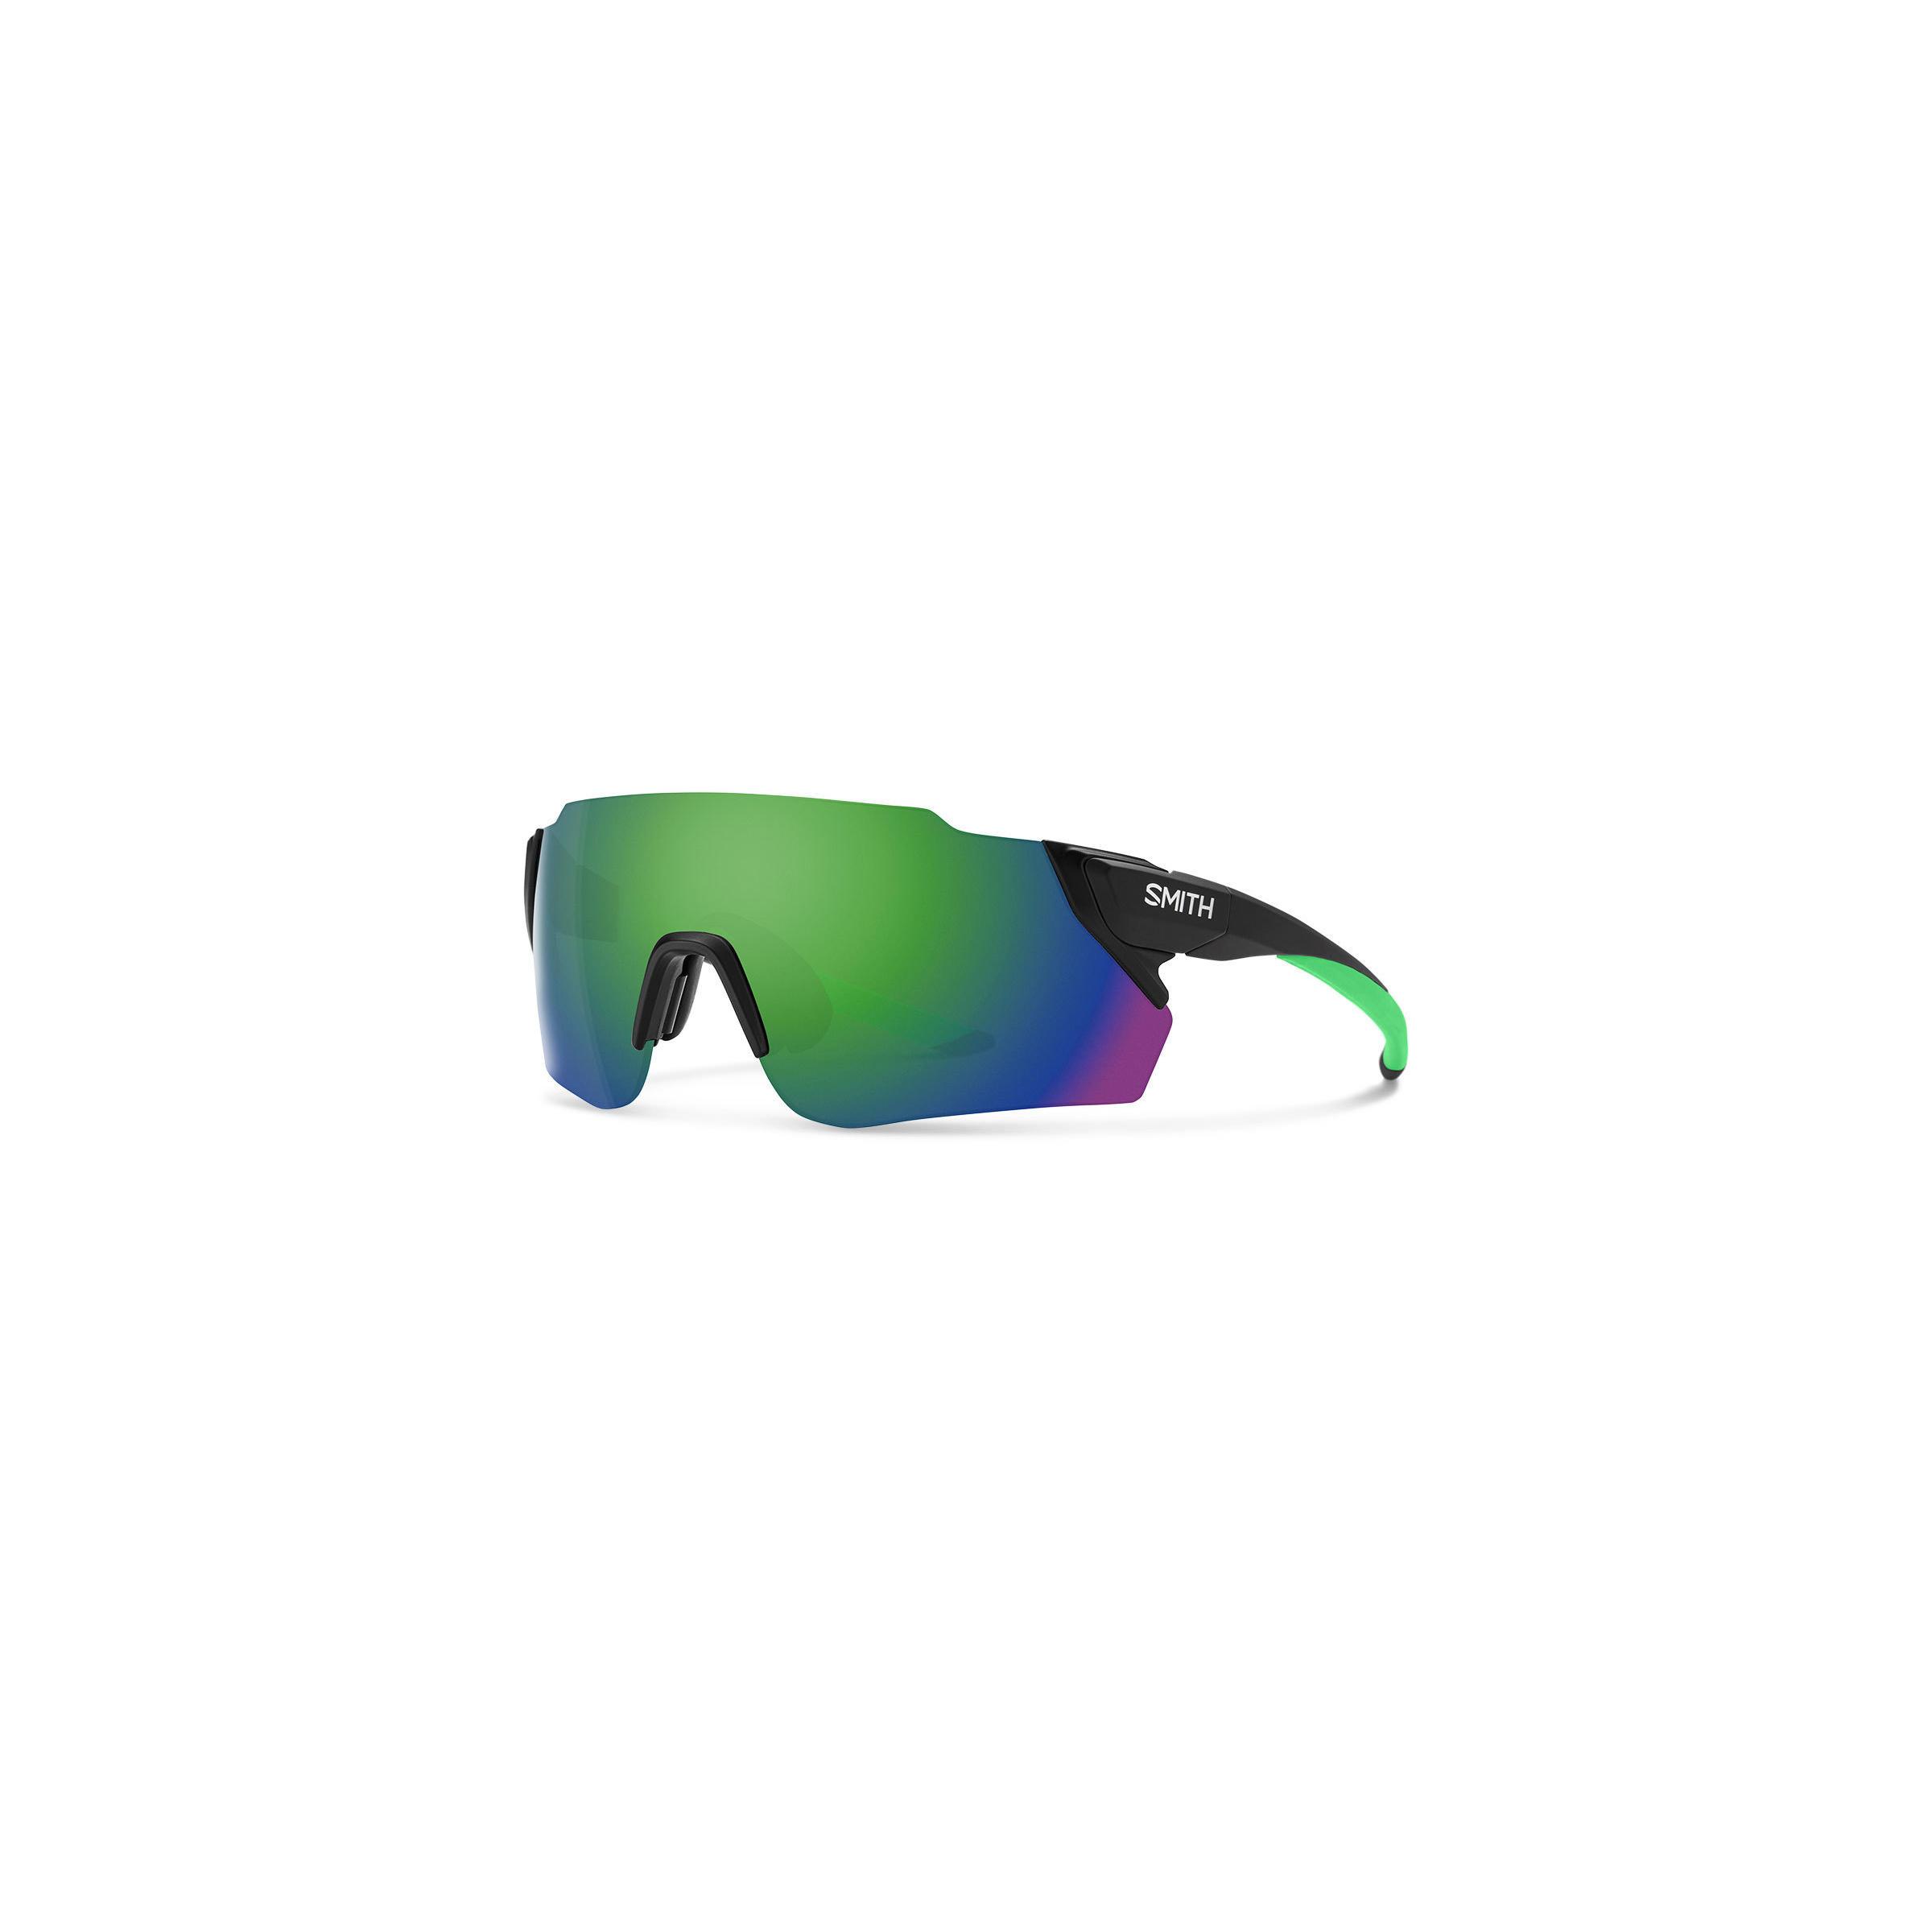 65335014e5d02 Smith Optics Attack Max - Denver Bike Shop